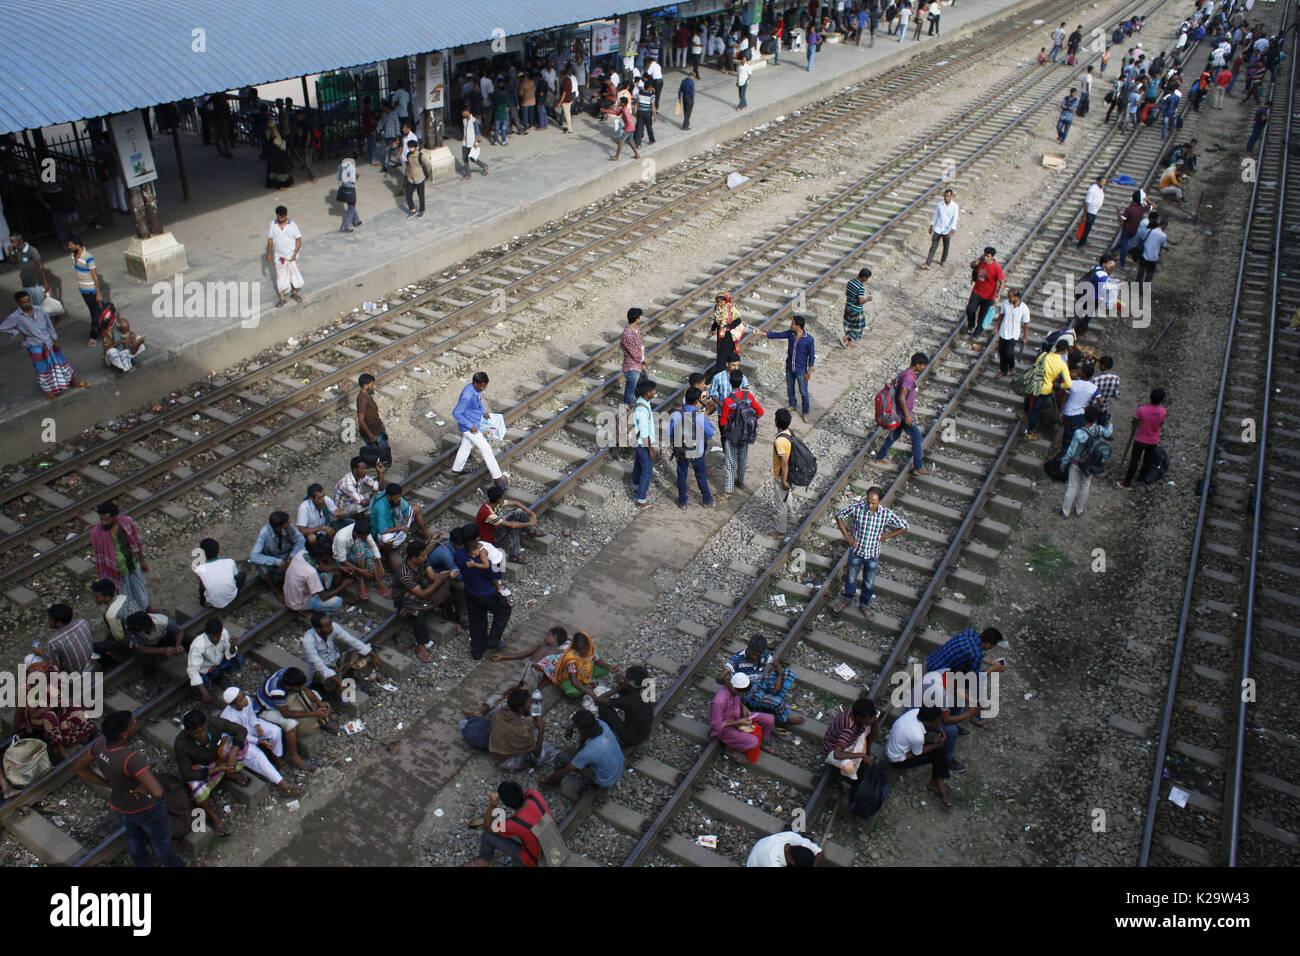 August 29, 2017 - Dhaka, Bangladesh - Bangladeshi homebound people wait for train as they head to their hometowns ahead of the Muslim holiday of Eid al-Adha, in Dhaka, Bangladesh. (Credit Image: © Suvra Kanti Das via ZUMA Wire) - Stock Image